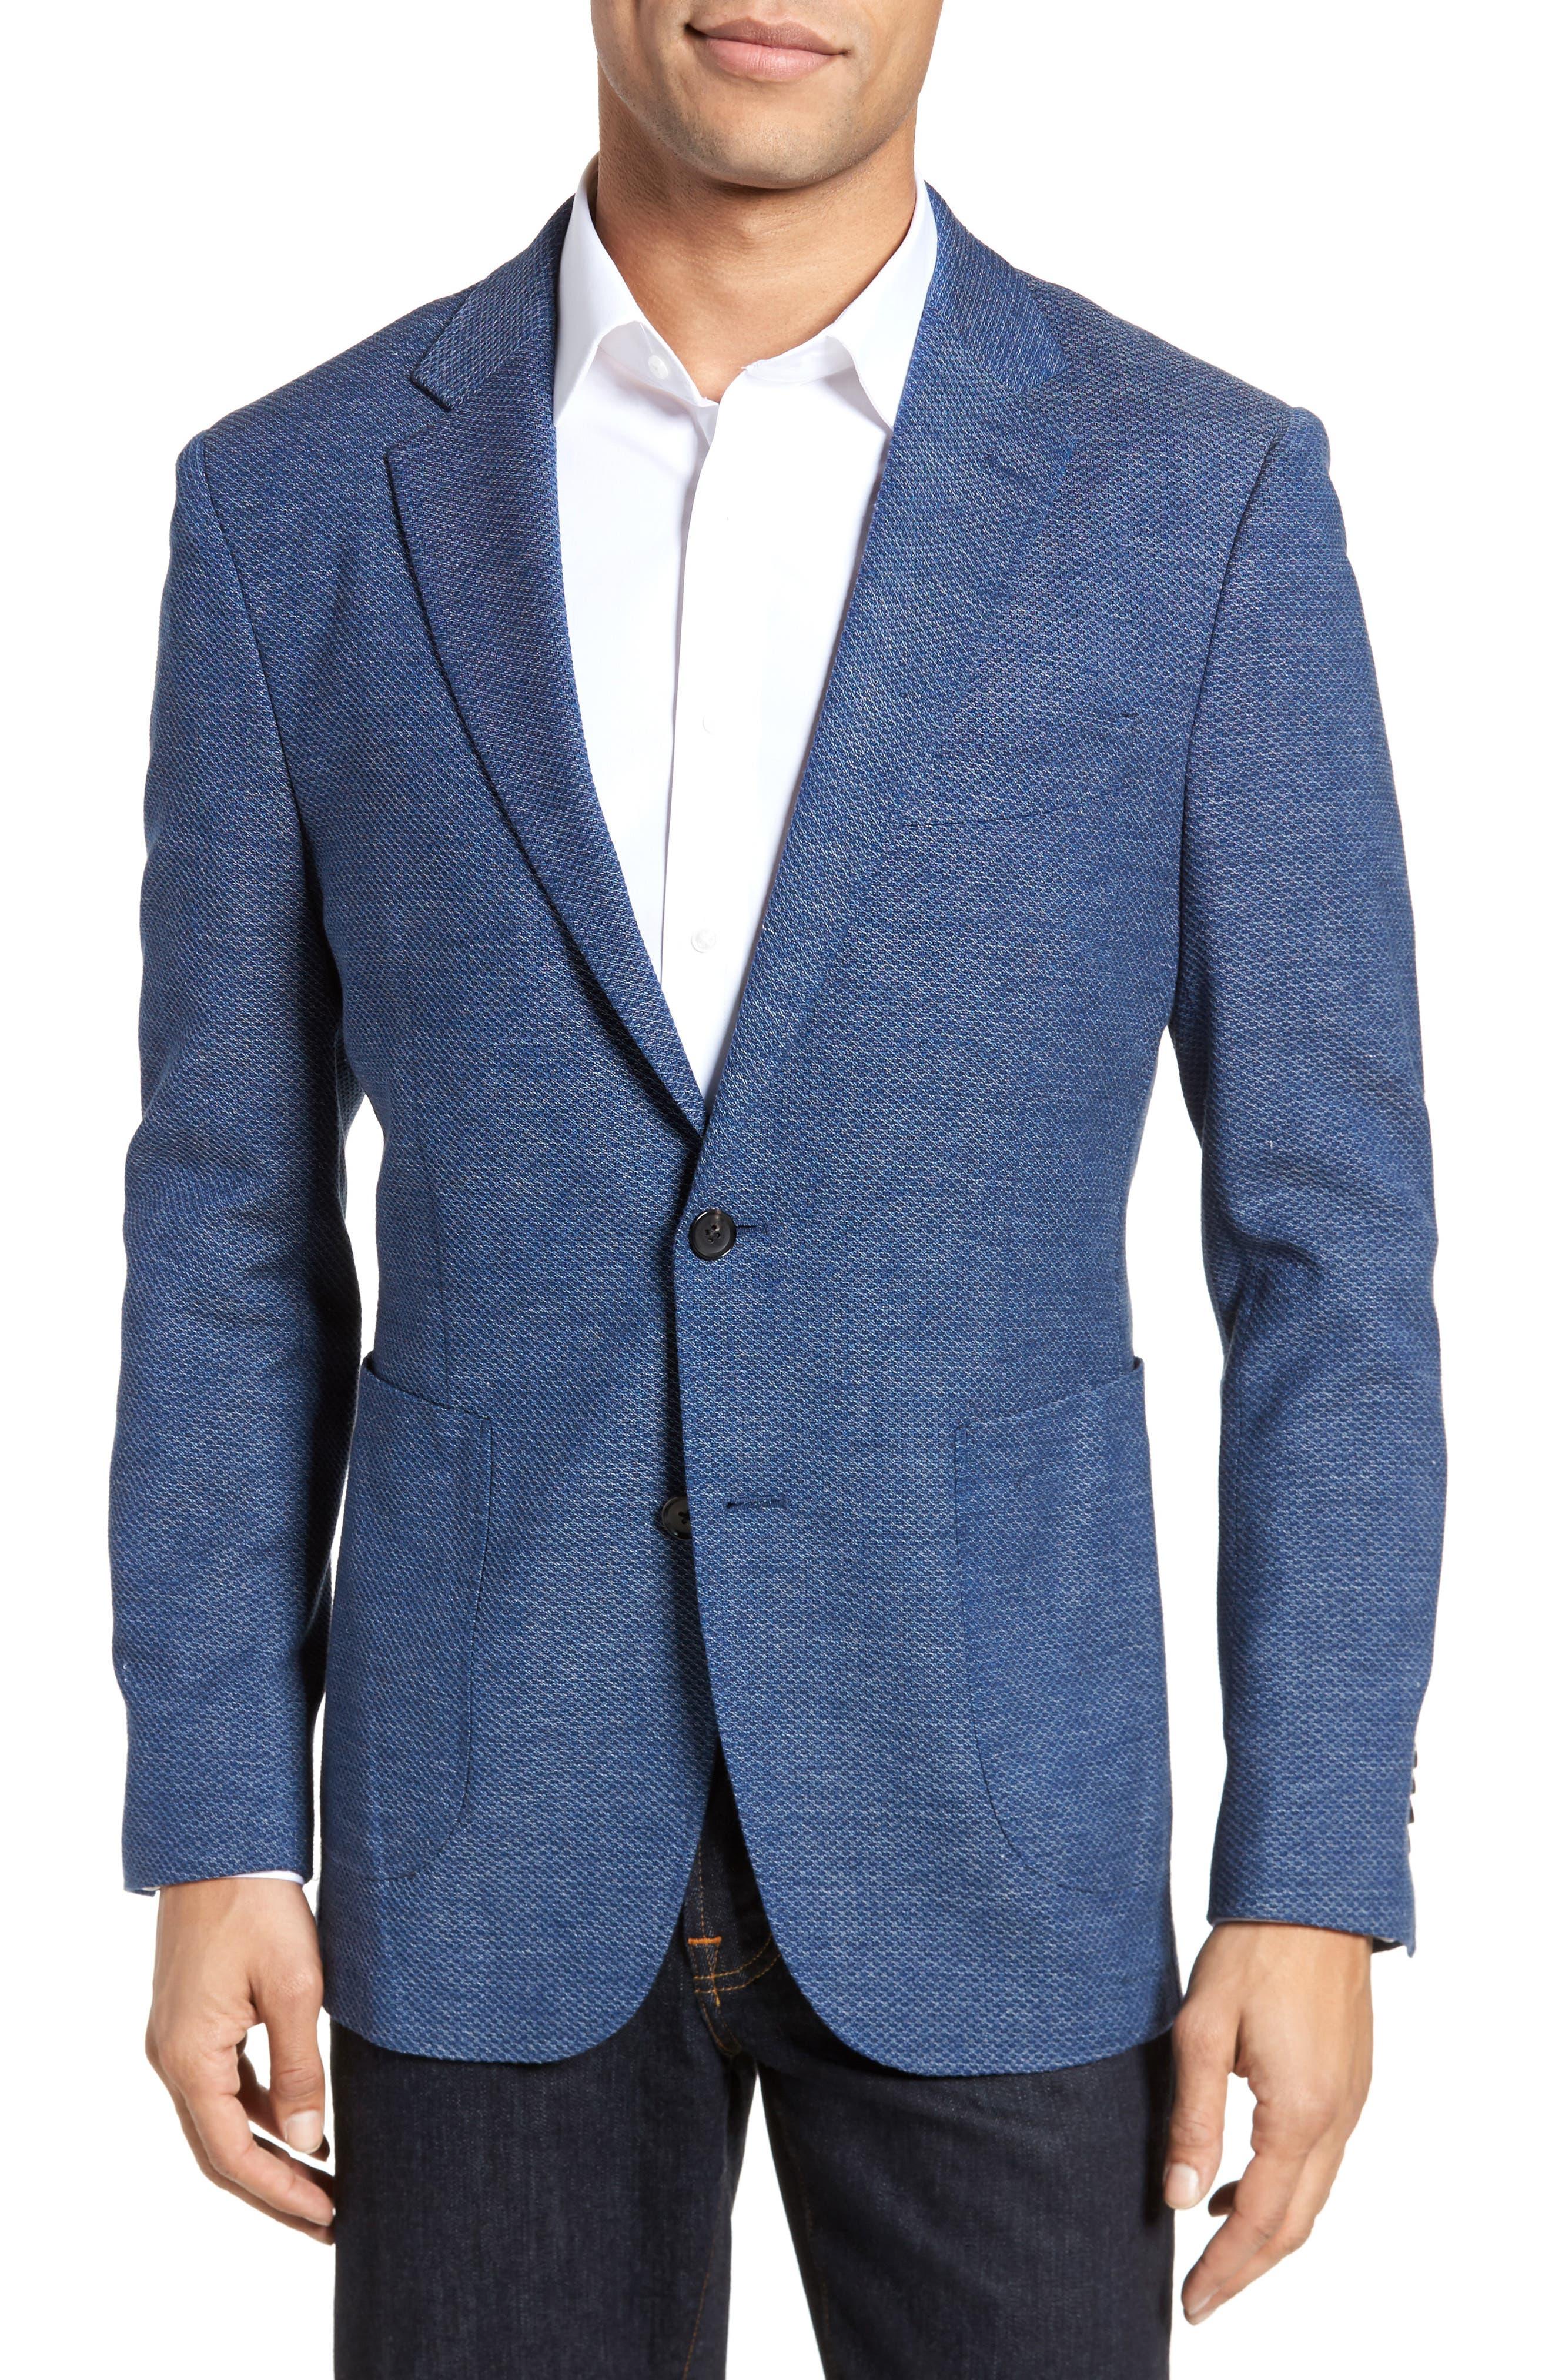 Fife Street Wool Blend Blazer,                             Main thumbnail 1, color,                             432